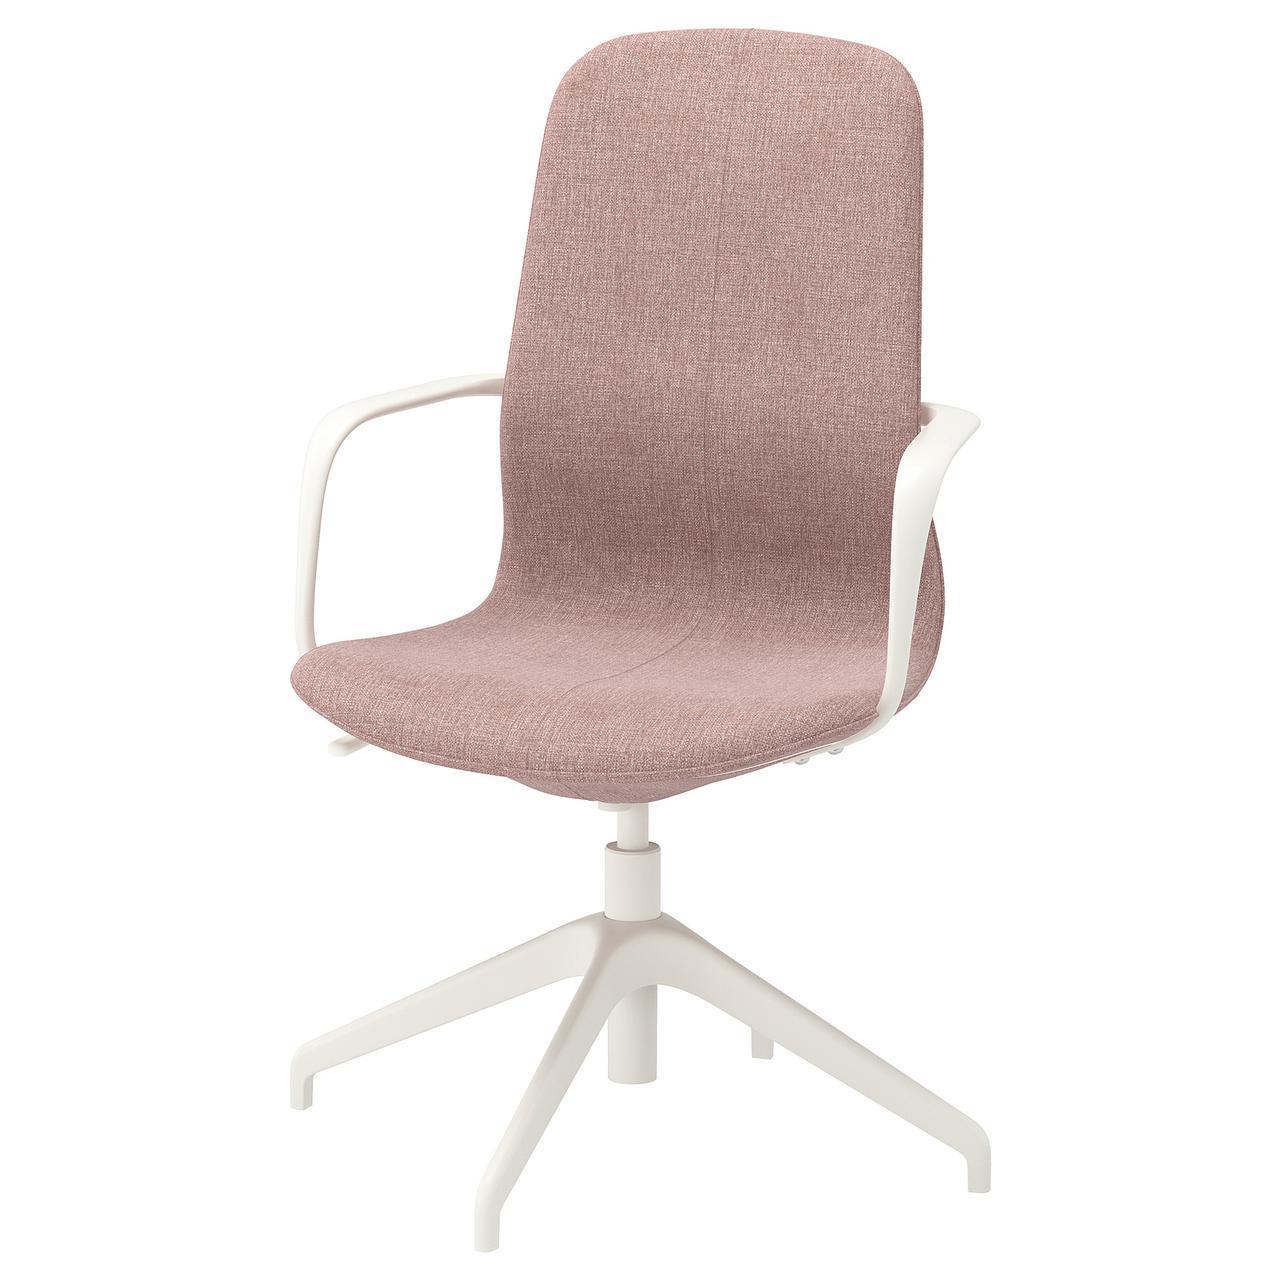 IKEA LANGFJALL (692.526.46) Компьютерное кресло, Gunnared светло-розовый